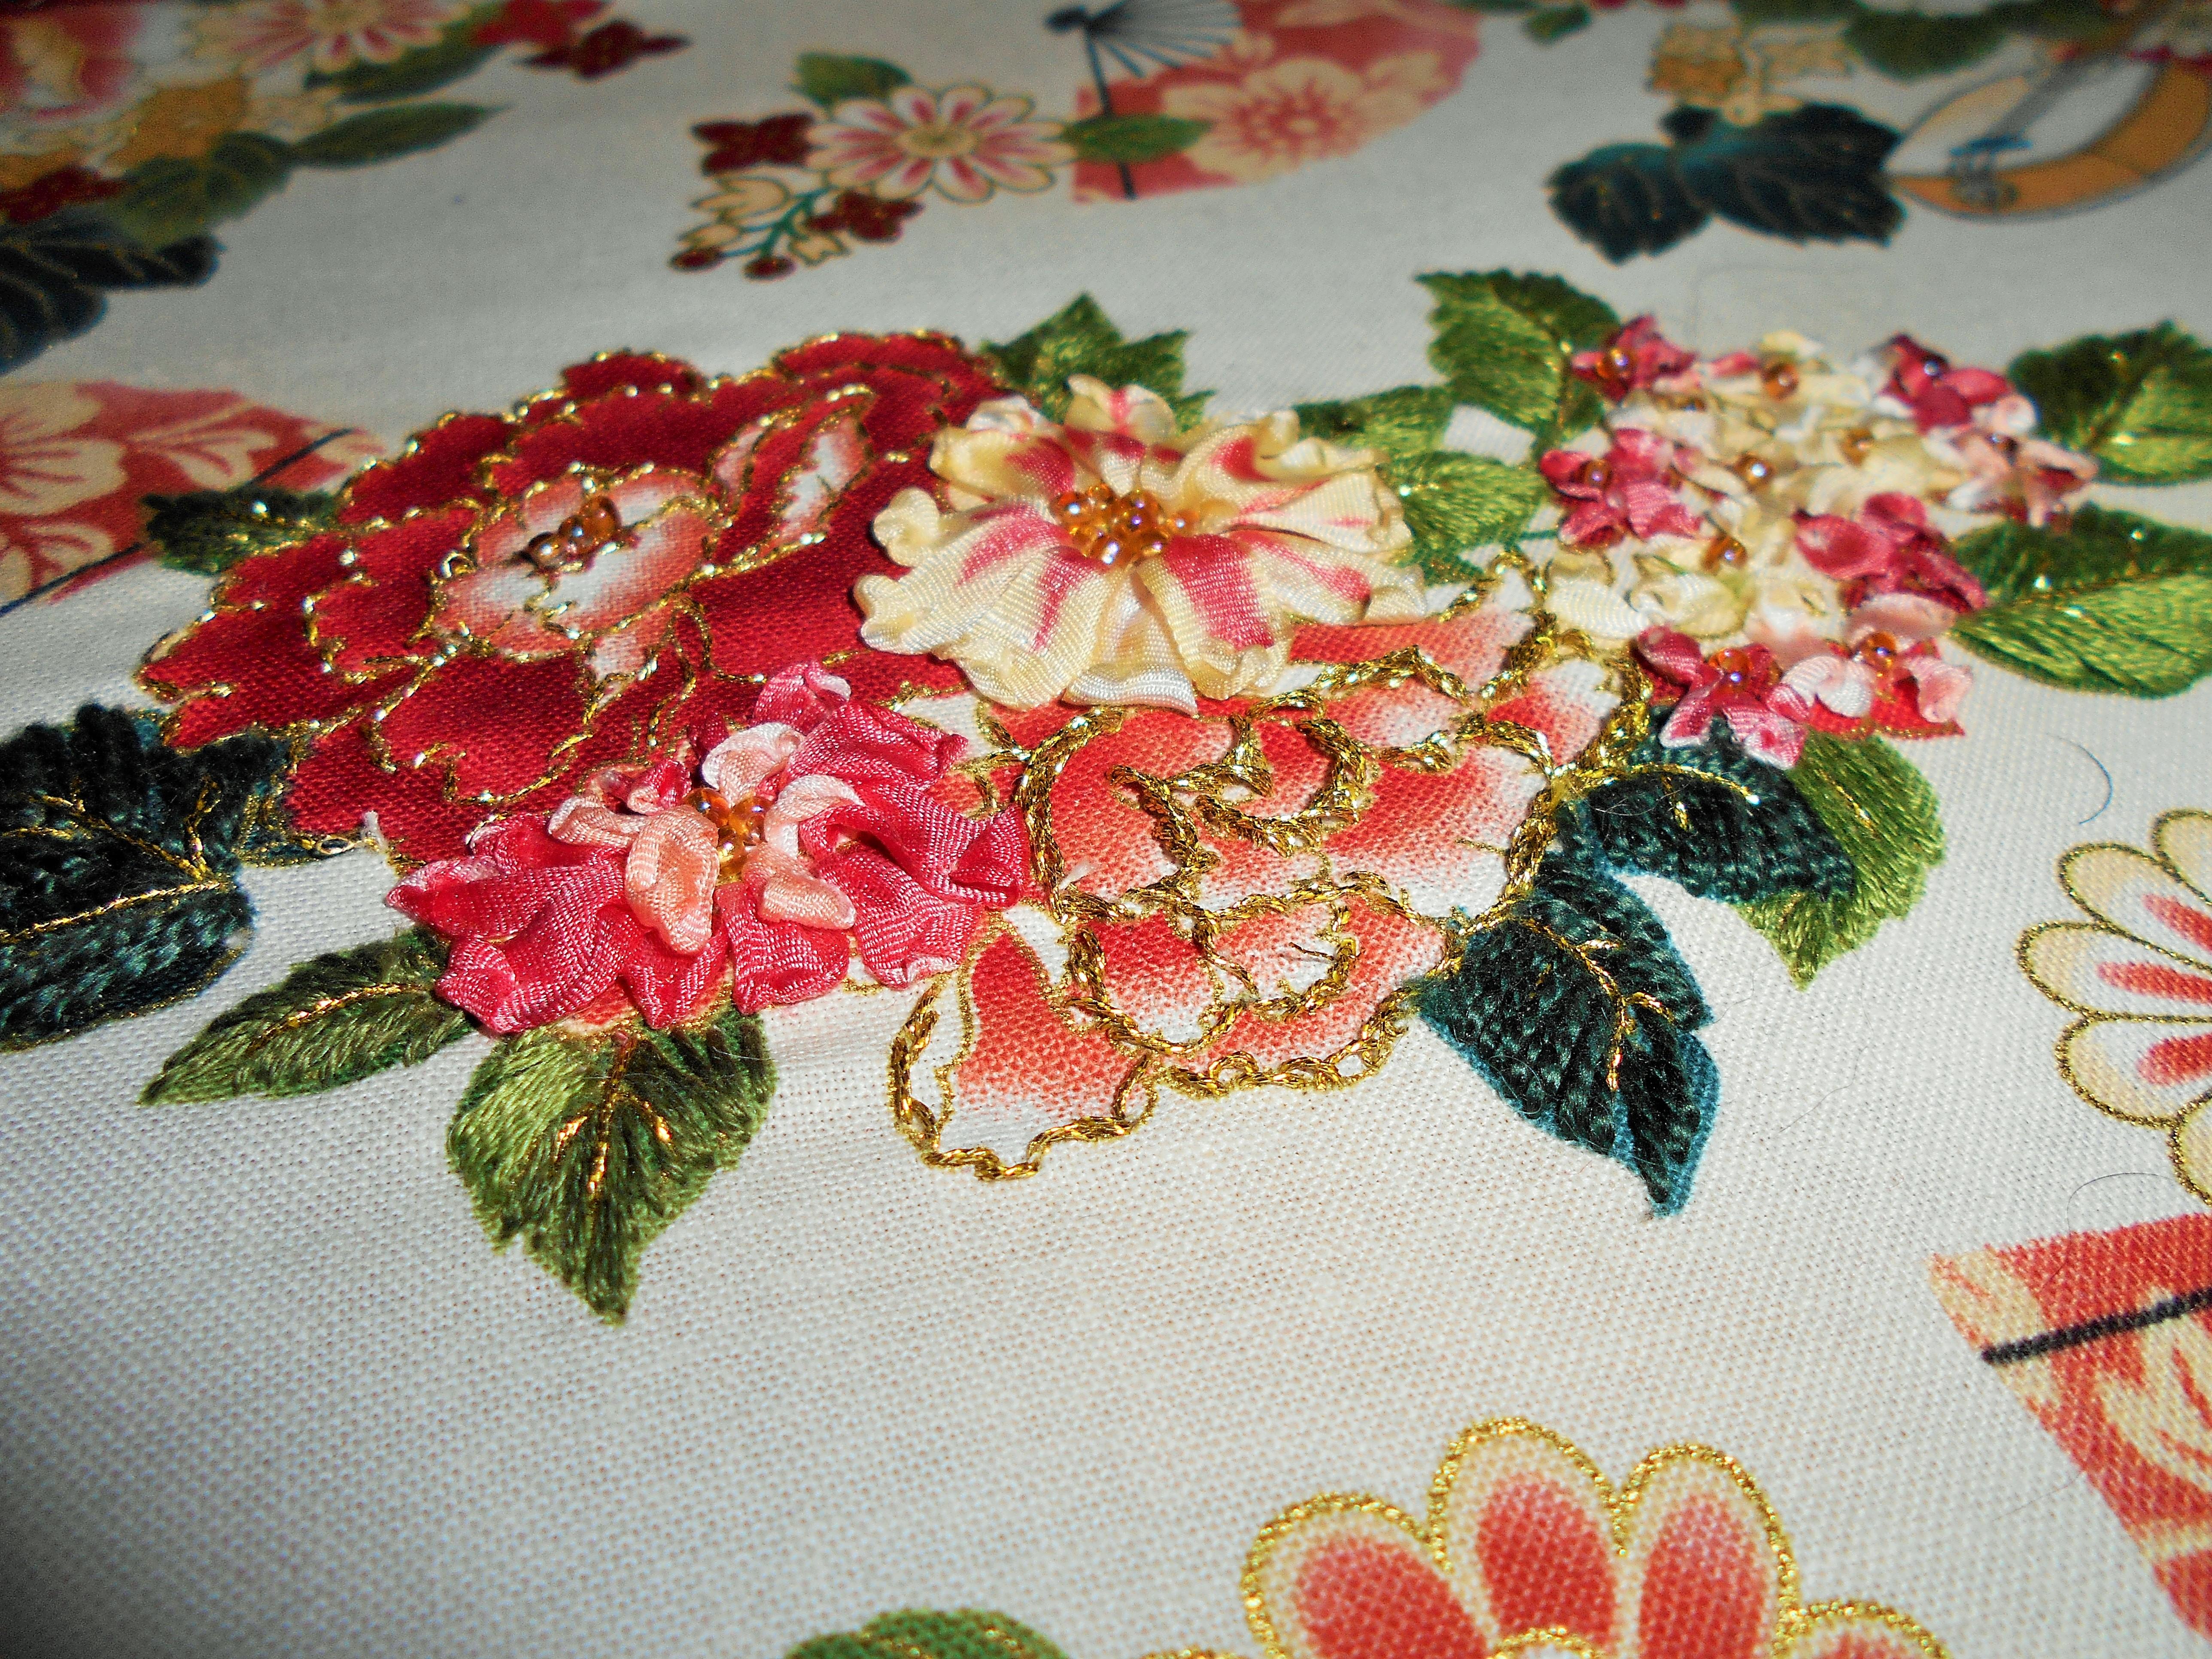 Ribbon embroidery bedspread designs - Dscn0054 2